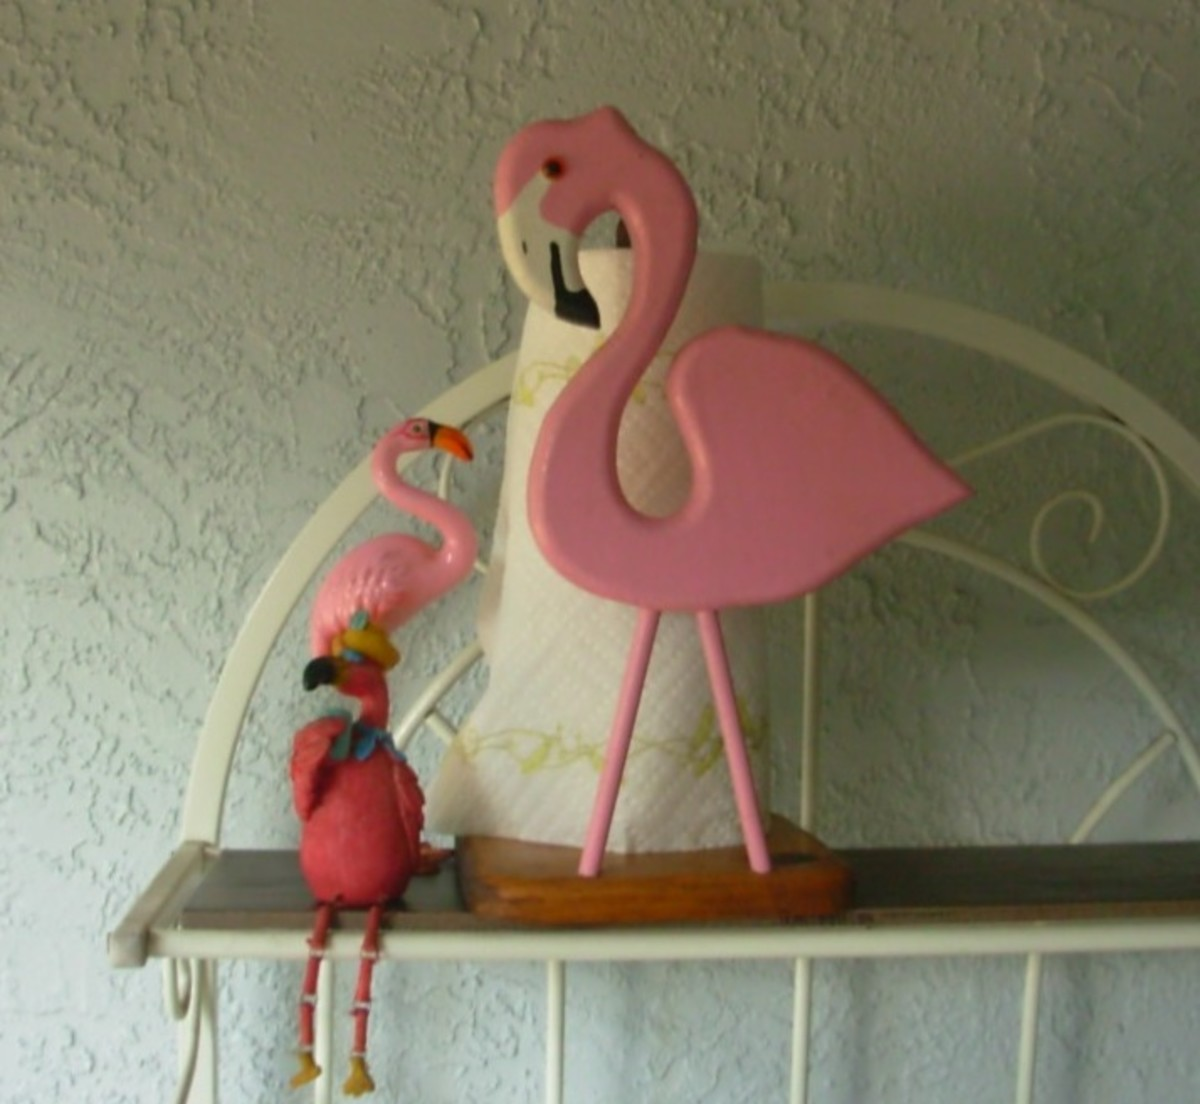 A flamingo paper towel older keeps company with a few flamingo figures.